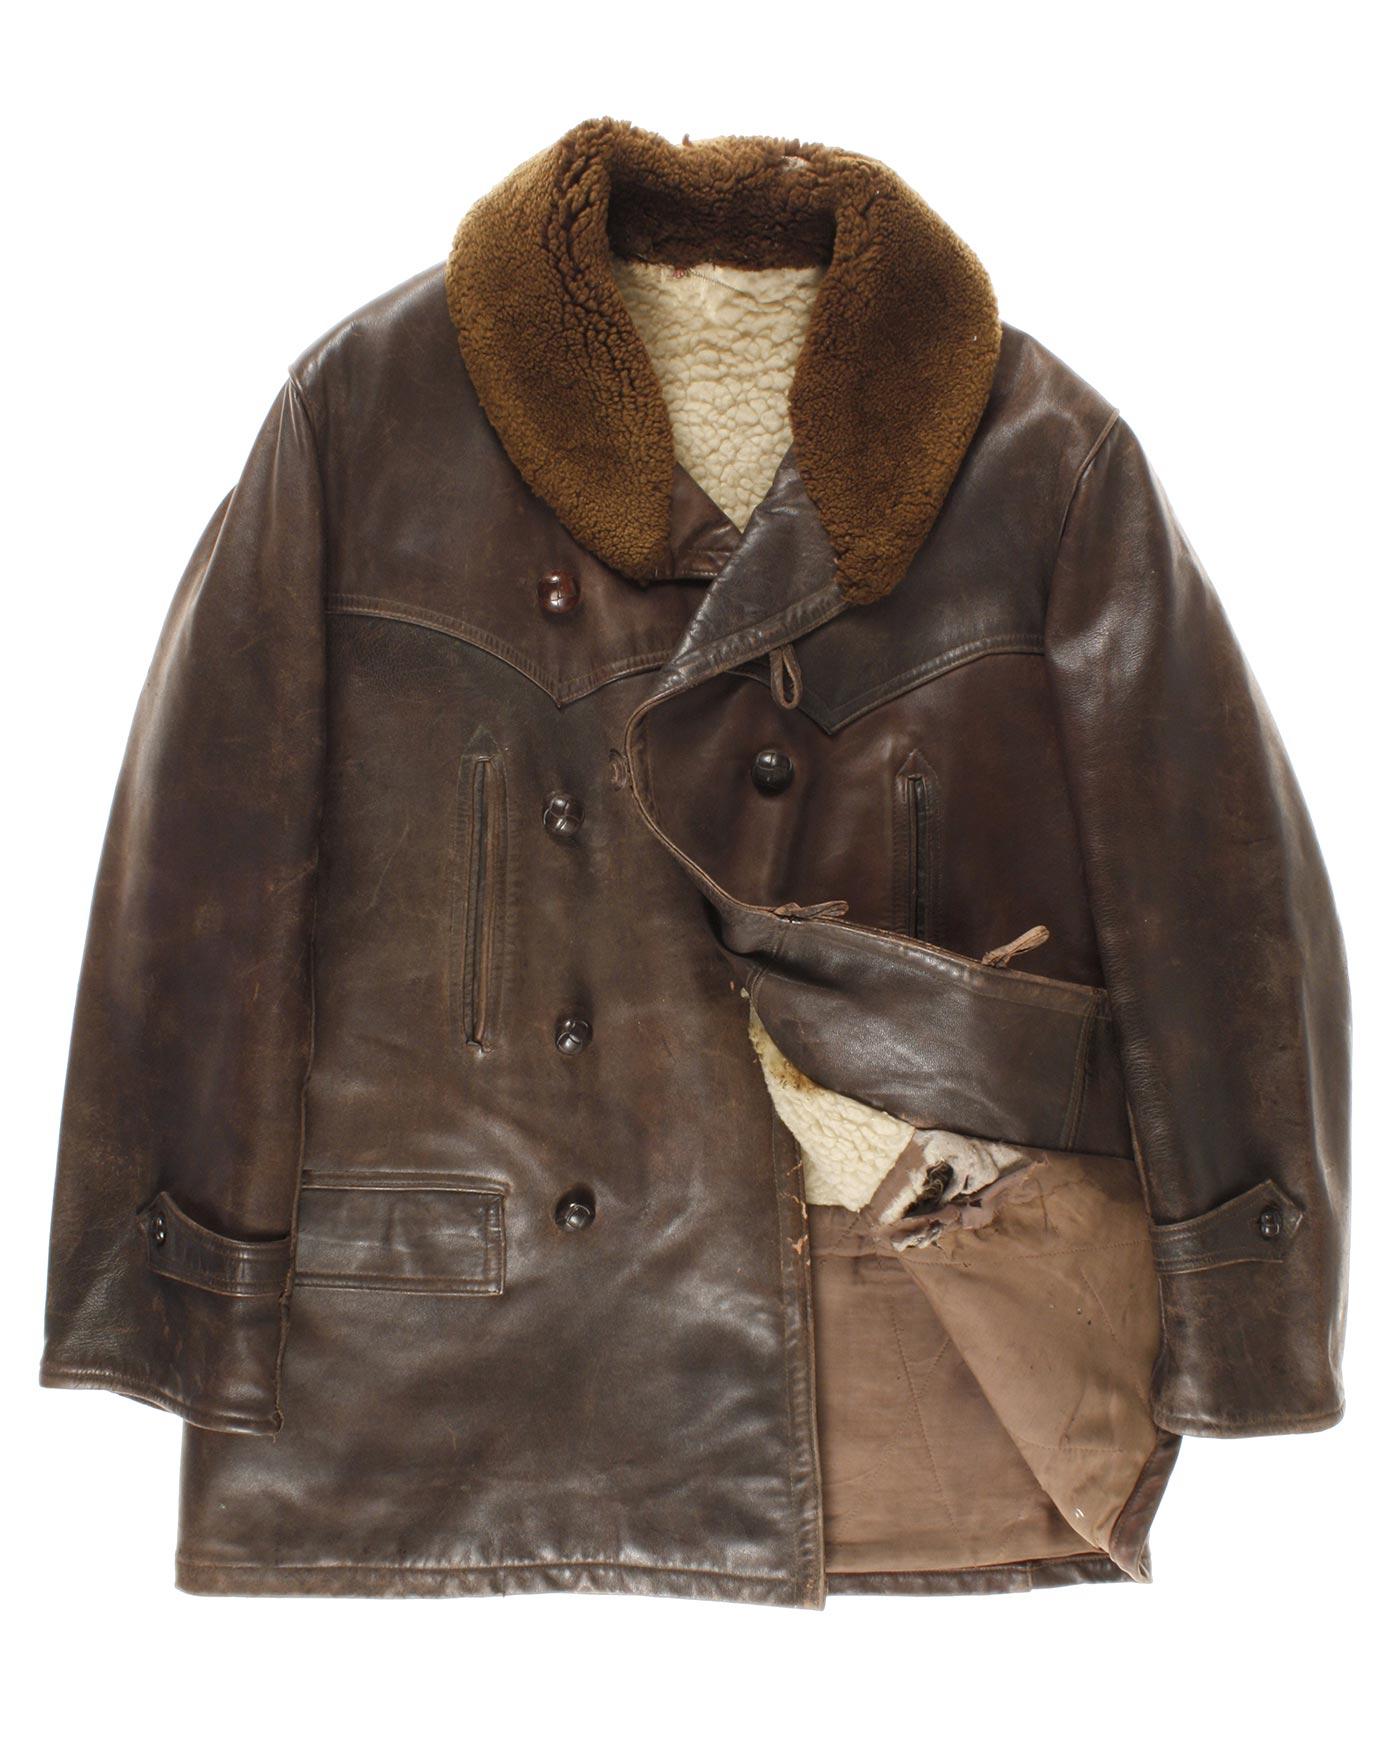 Leather jacket europe - Leather Jacket Origin Norther Europe 40 50s